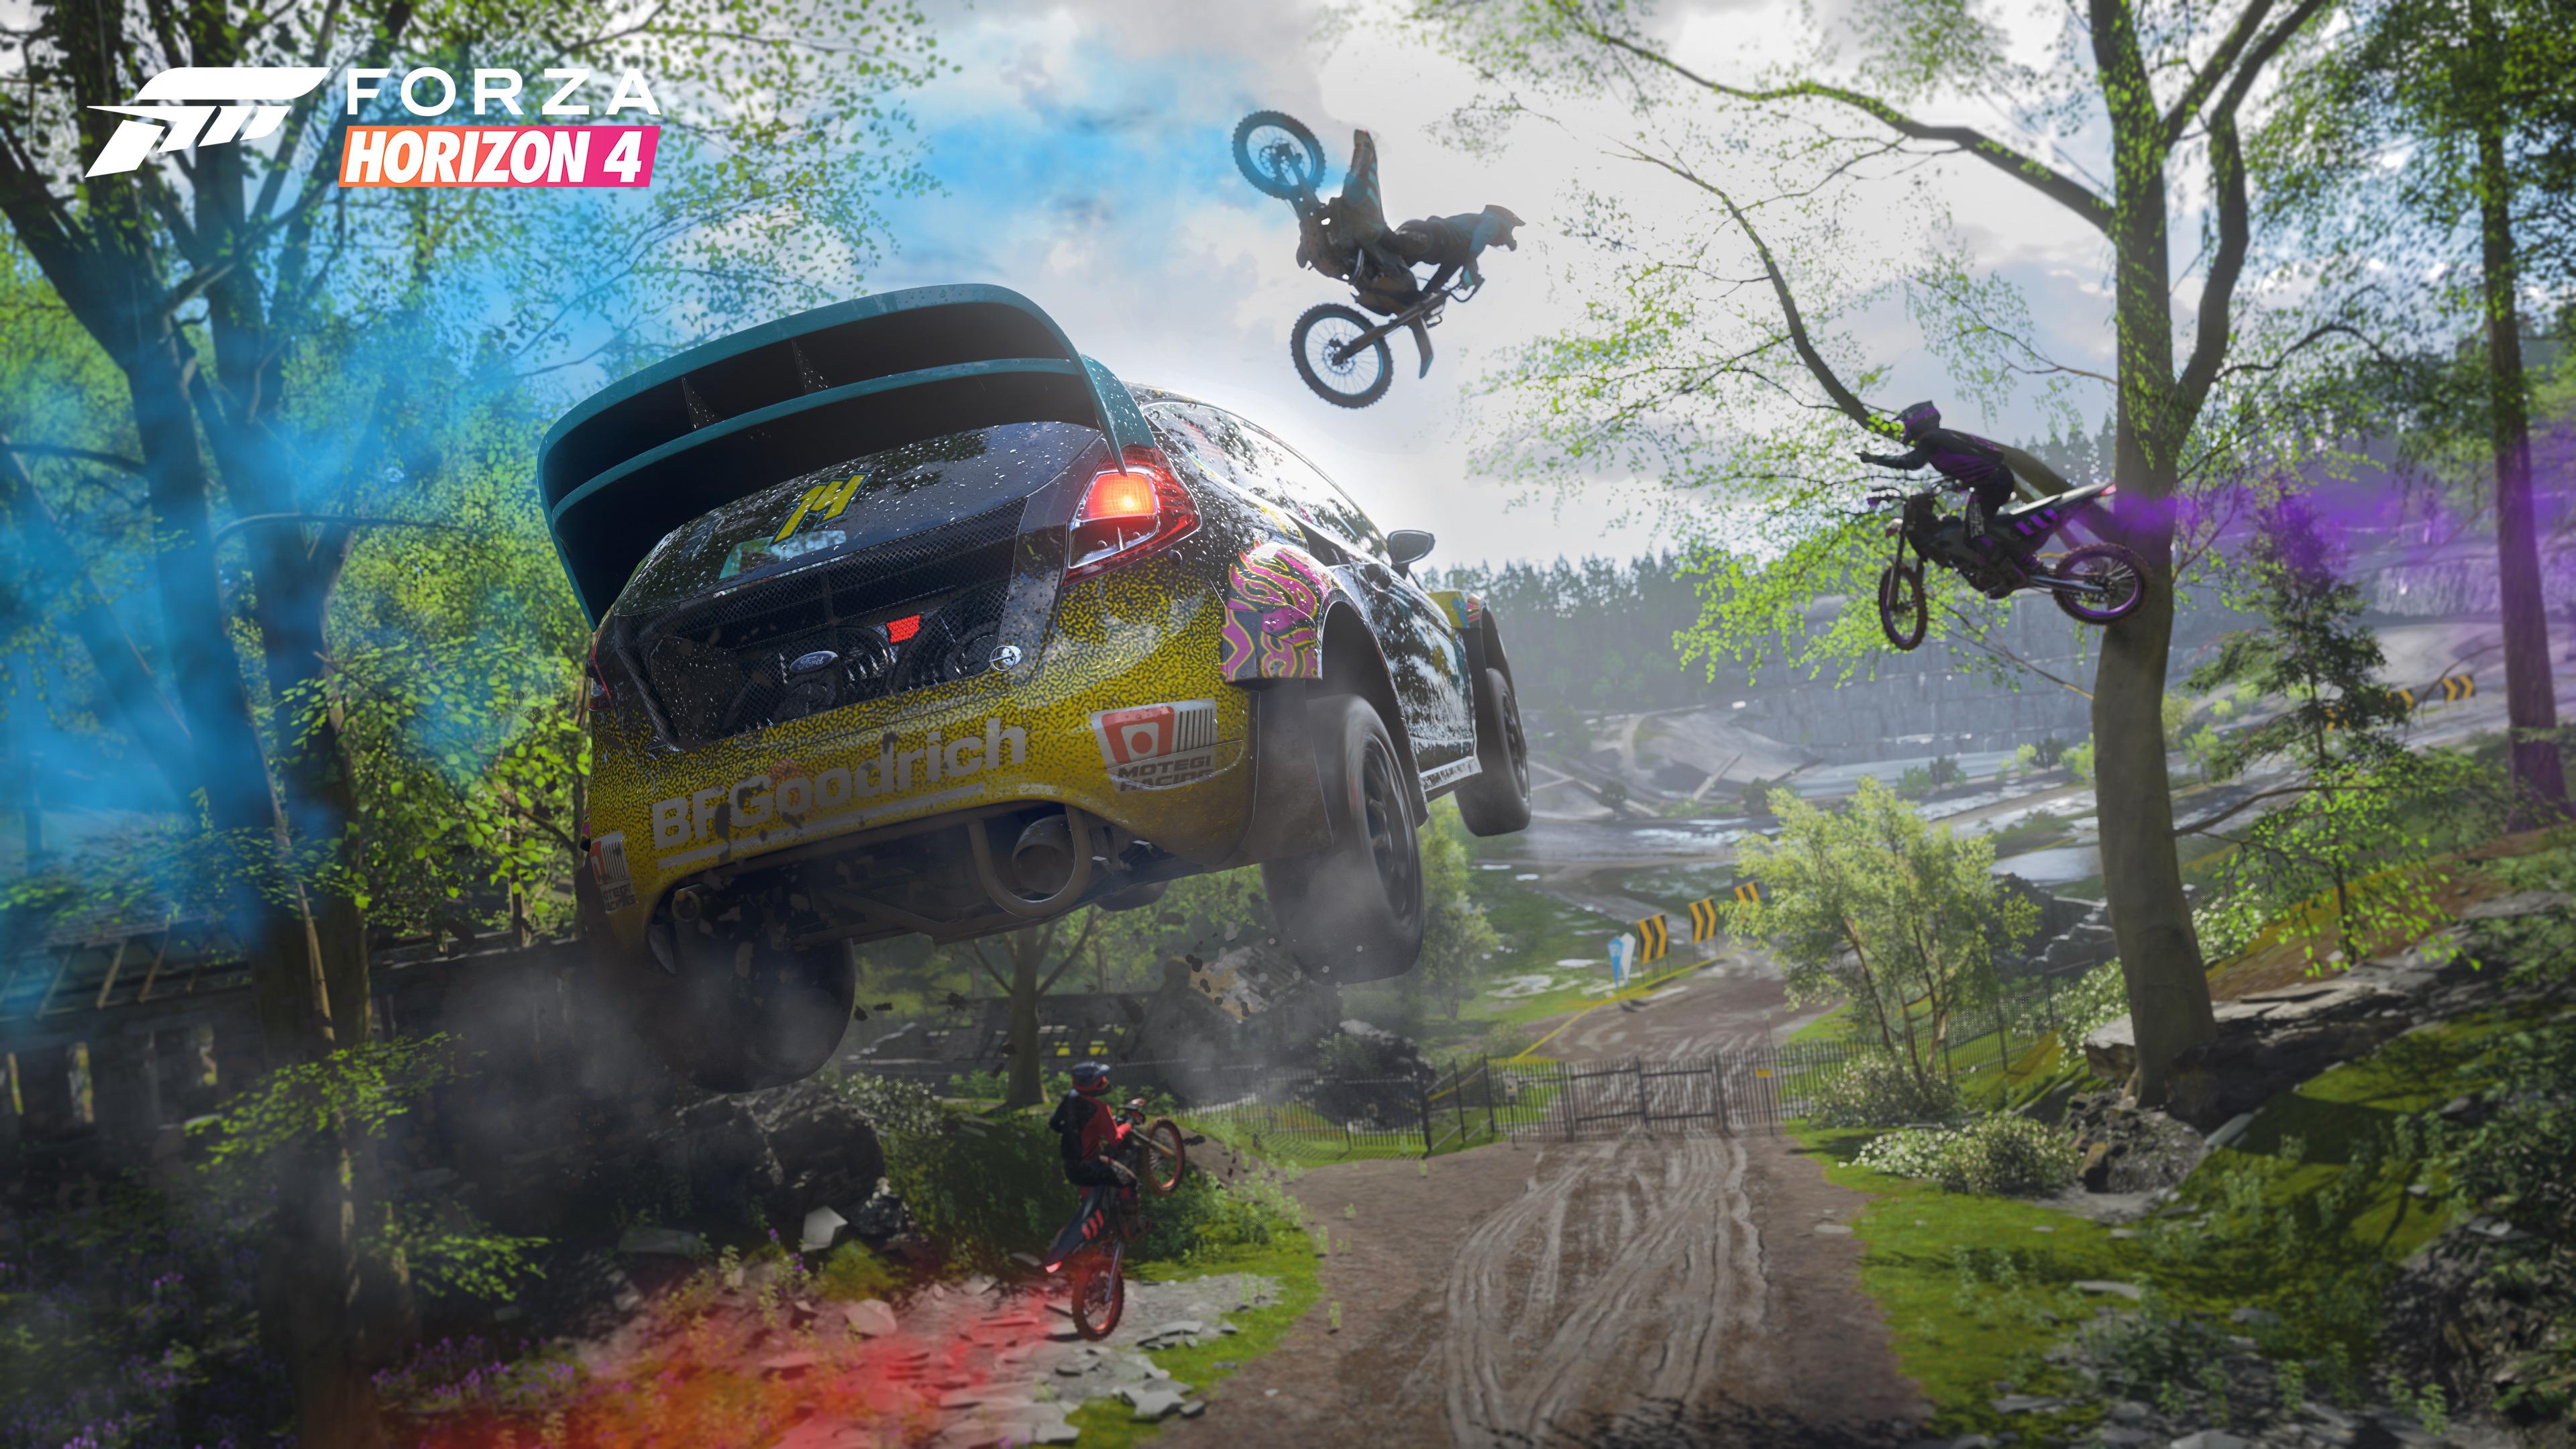 Forza Horizon 4 Wallpaper: 640x1136 Forza Horizon 4 2018 Video Game IPhone 5,5c,5S,SE